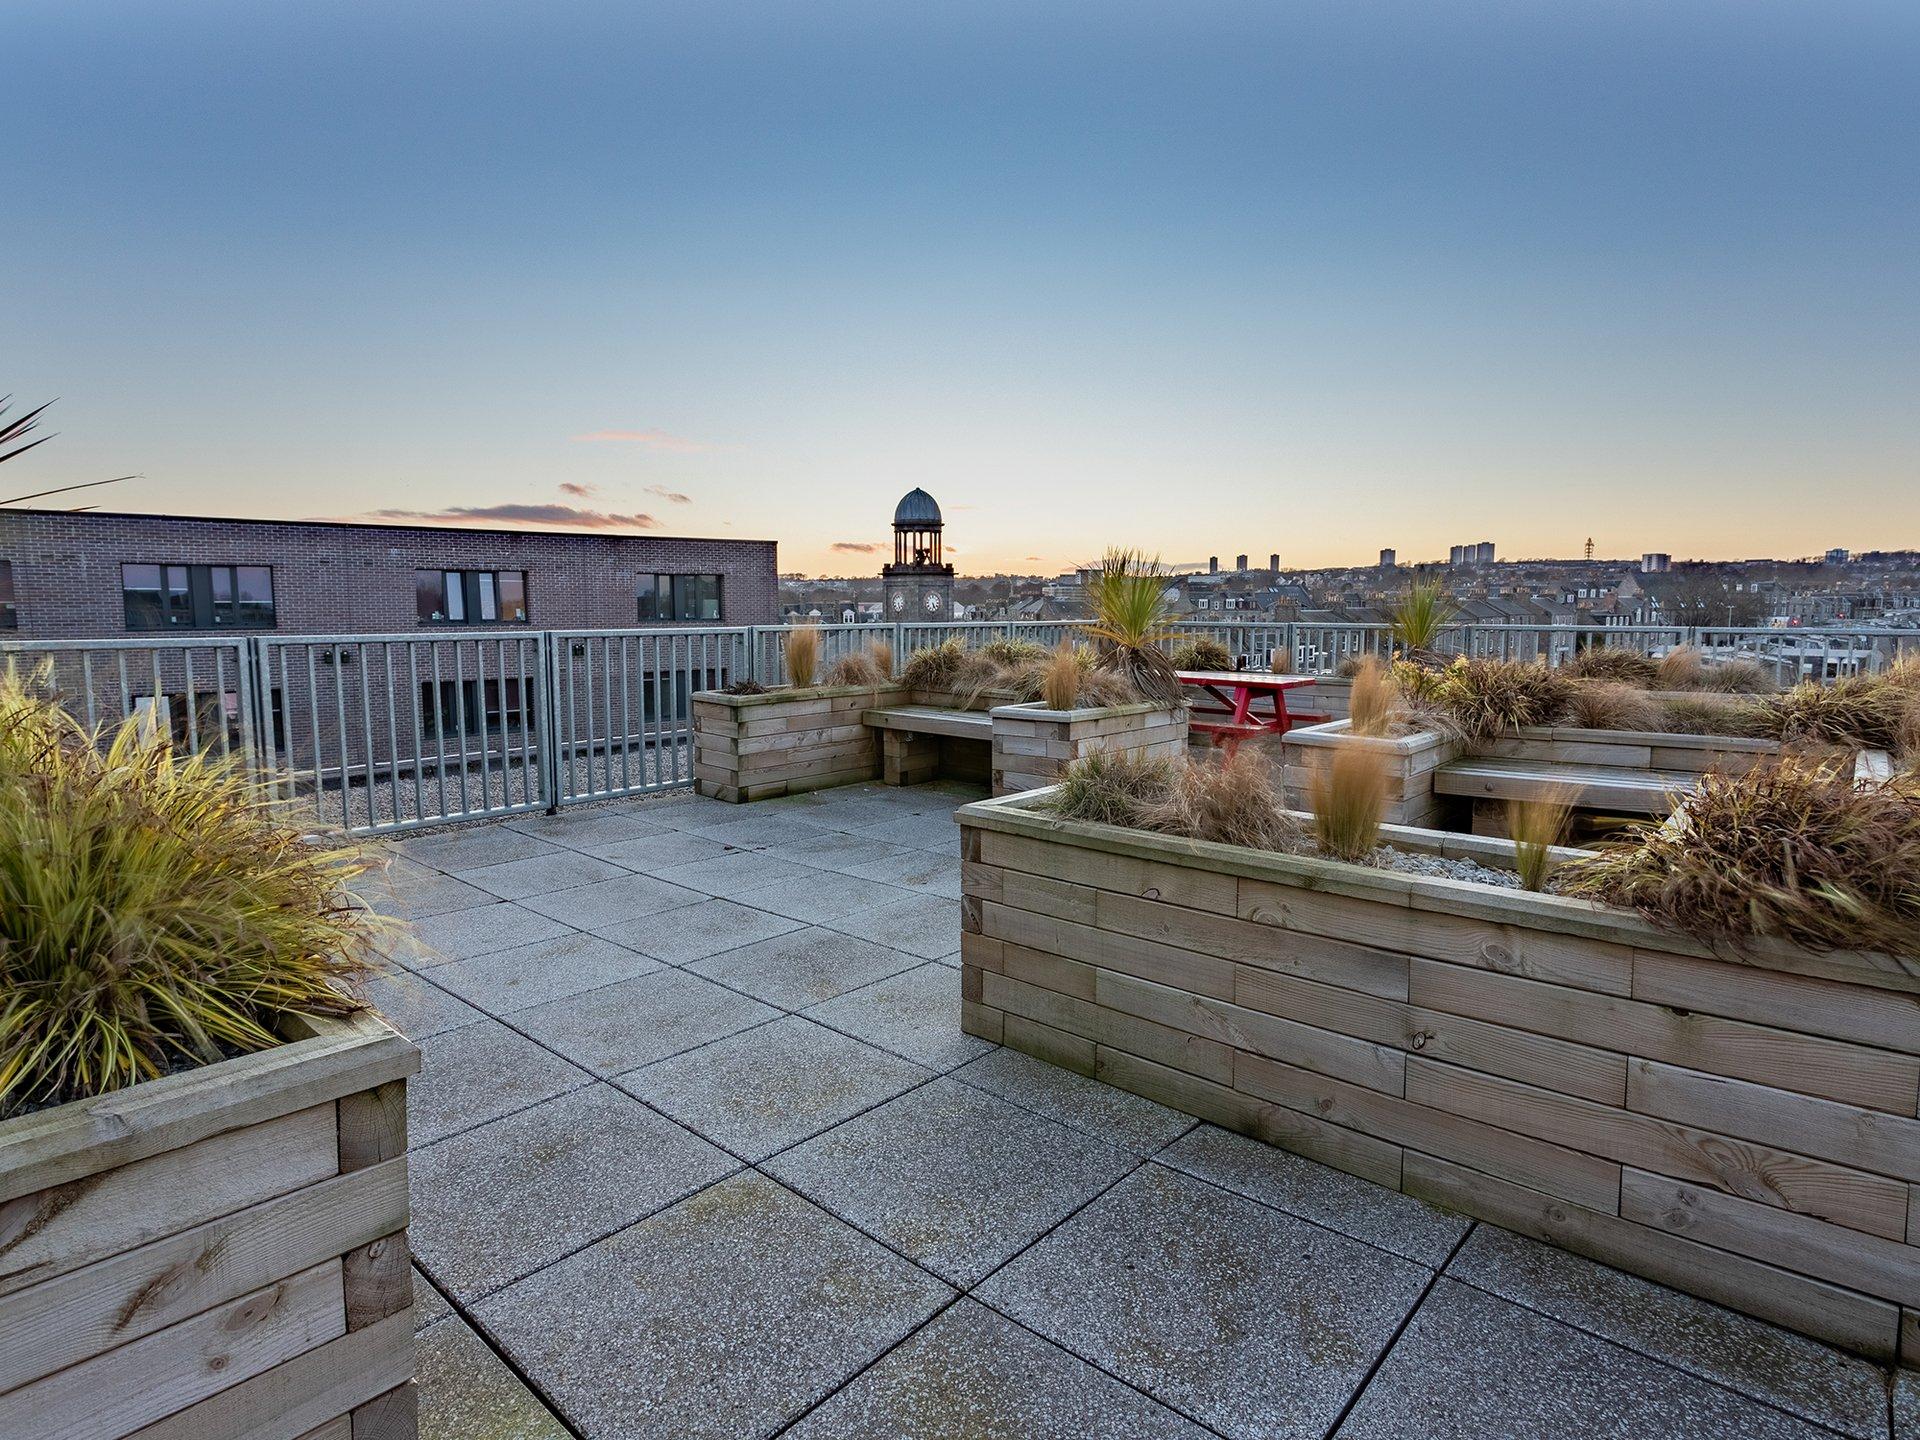 Aberdeen Powis Place Court Yard